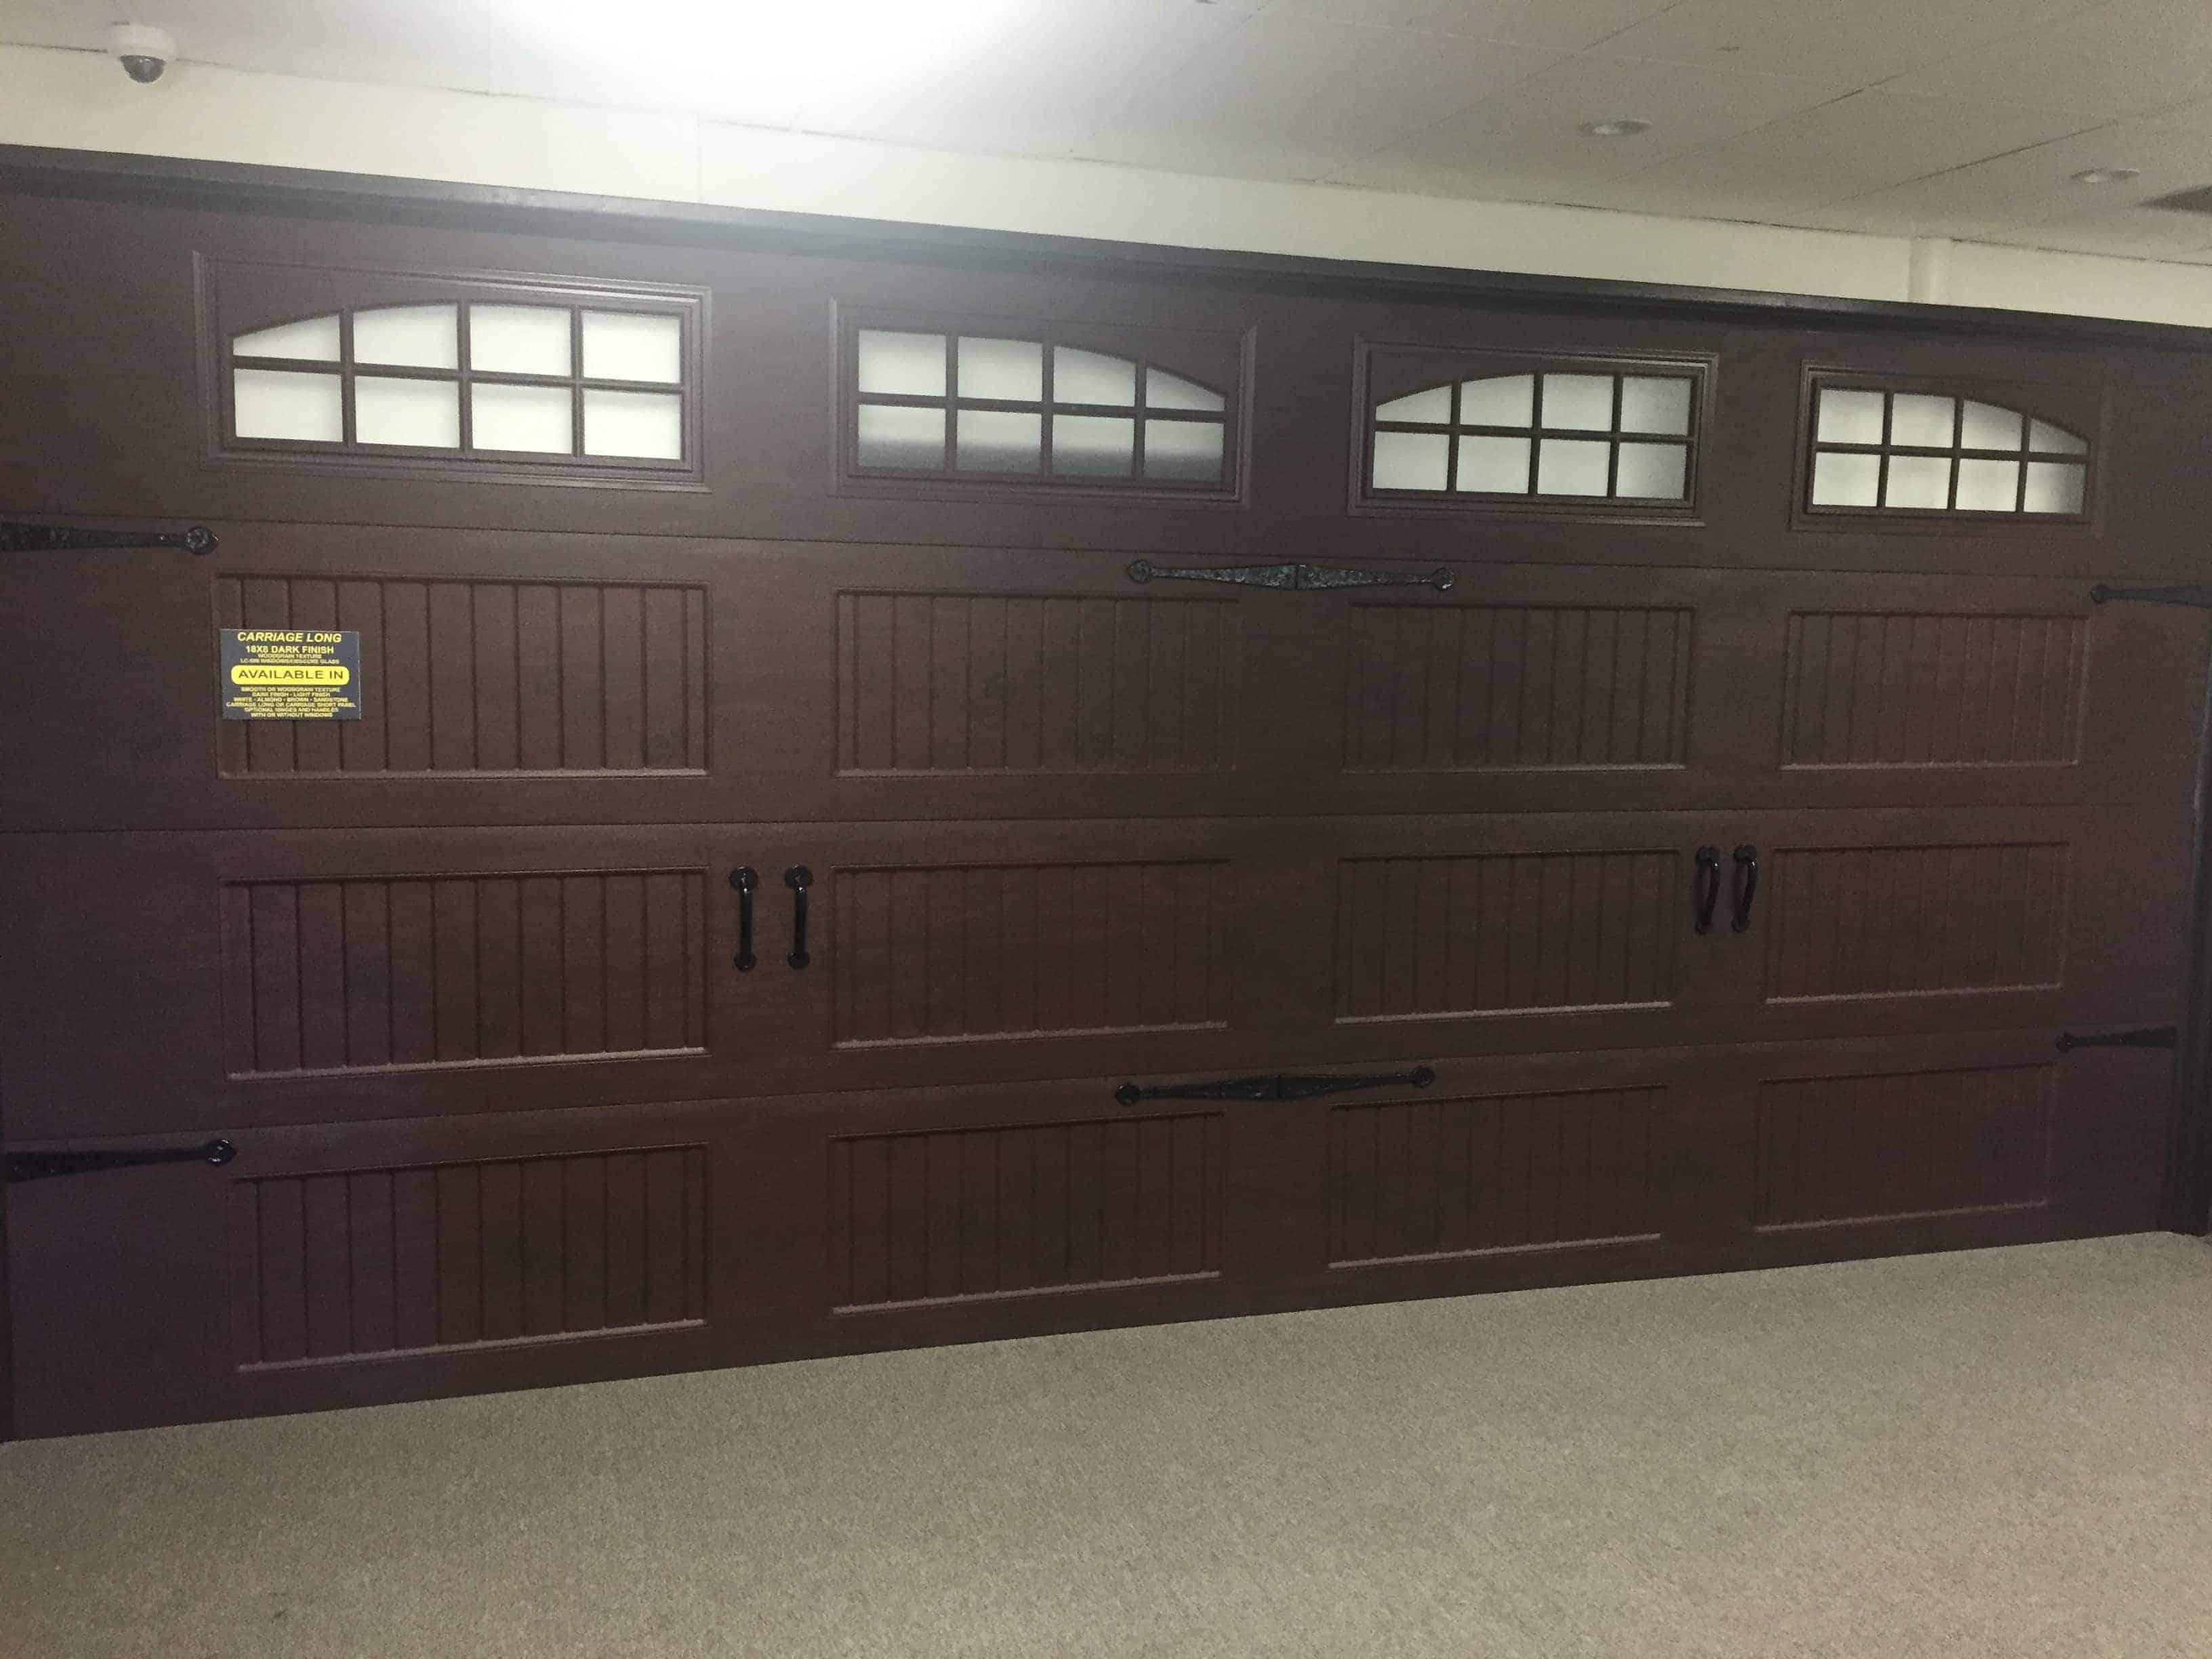 Gold River Garage door repair and replacement